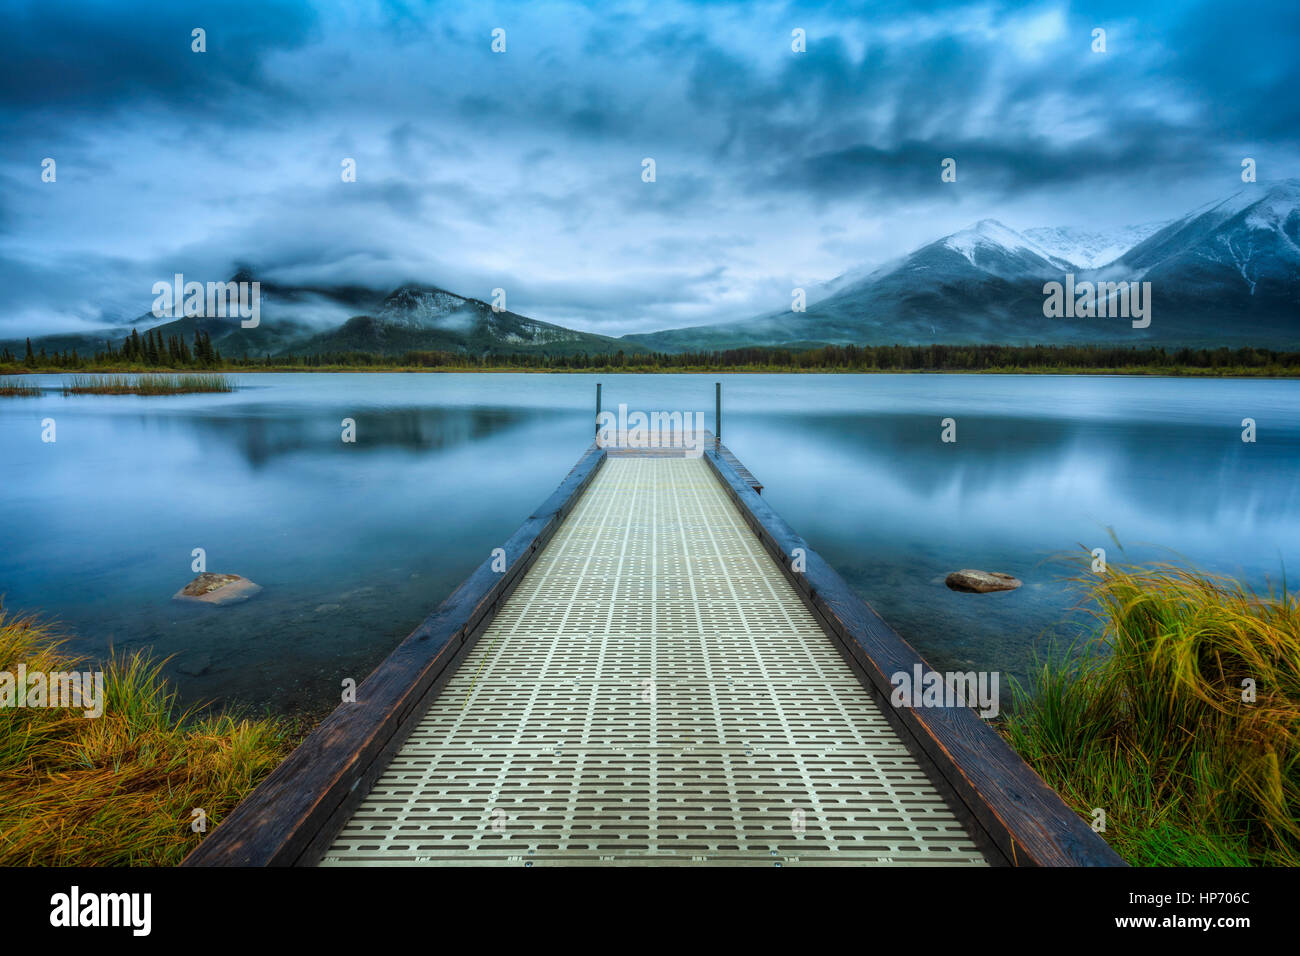 Vermillion Lakes, Banff, Alberta, Canada - Stock Image